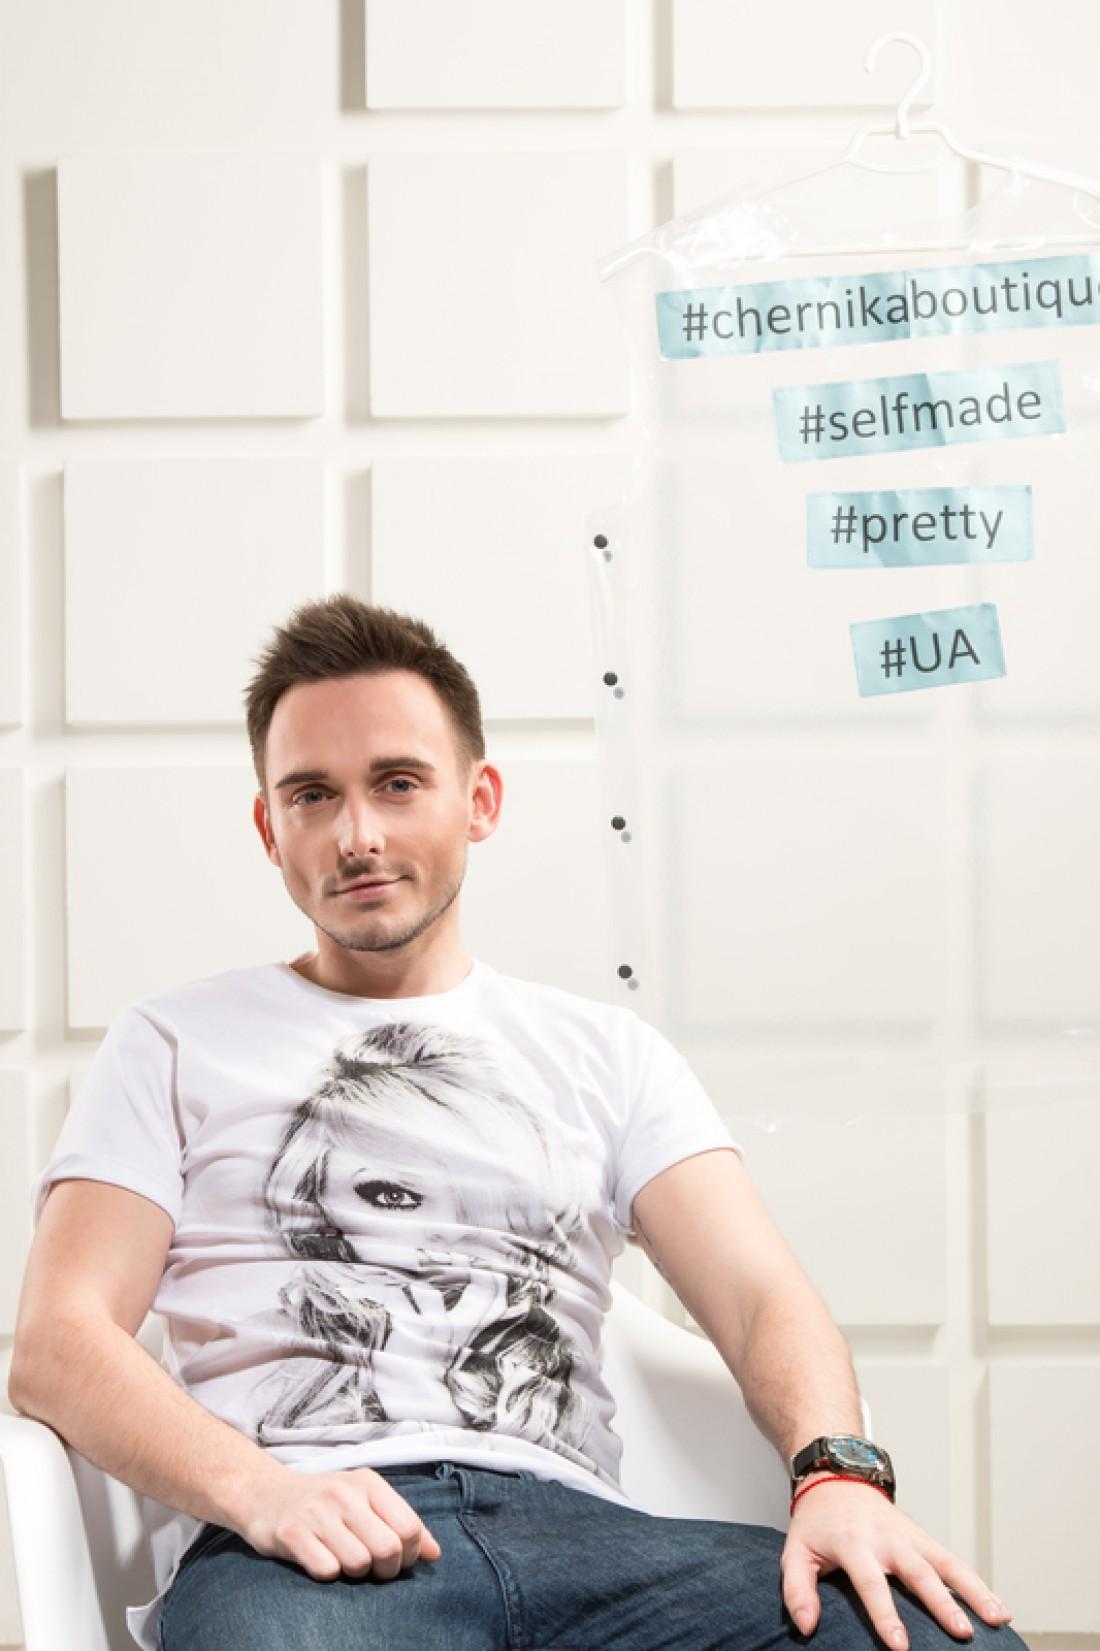 Сергей Черкас, креативный директор брендов Cher Nika by Cherkas и Cher Nika Boutique